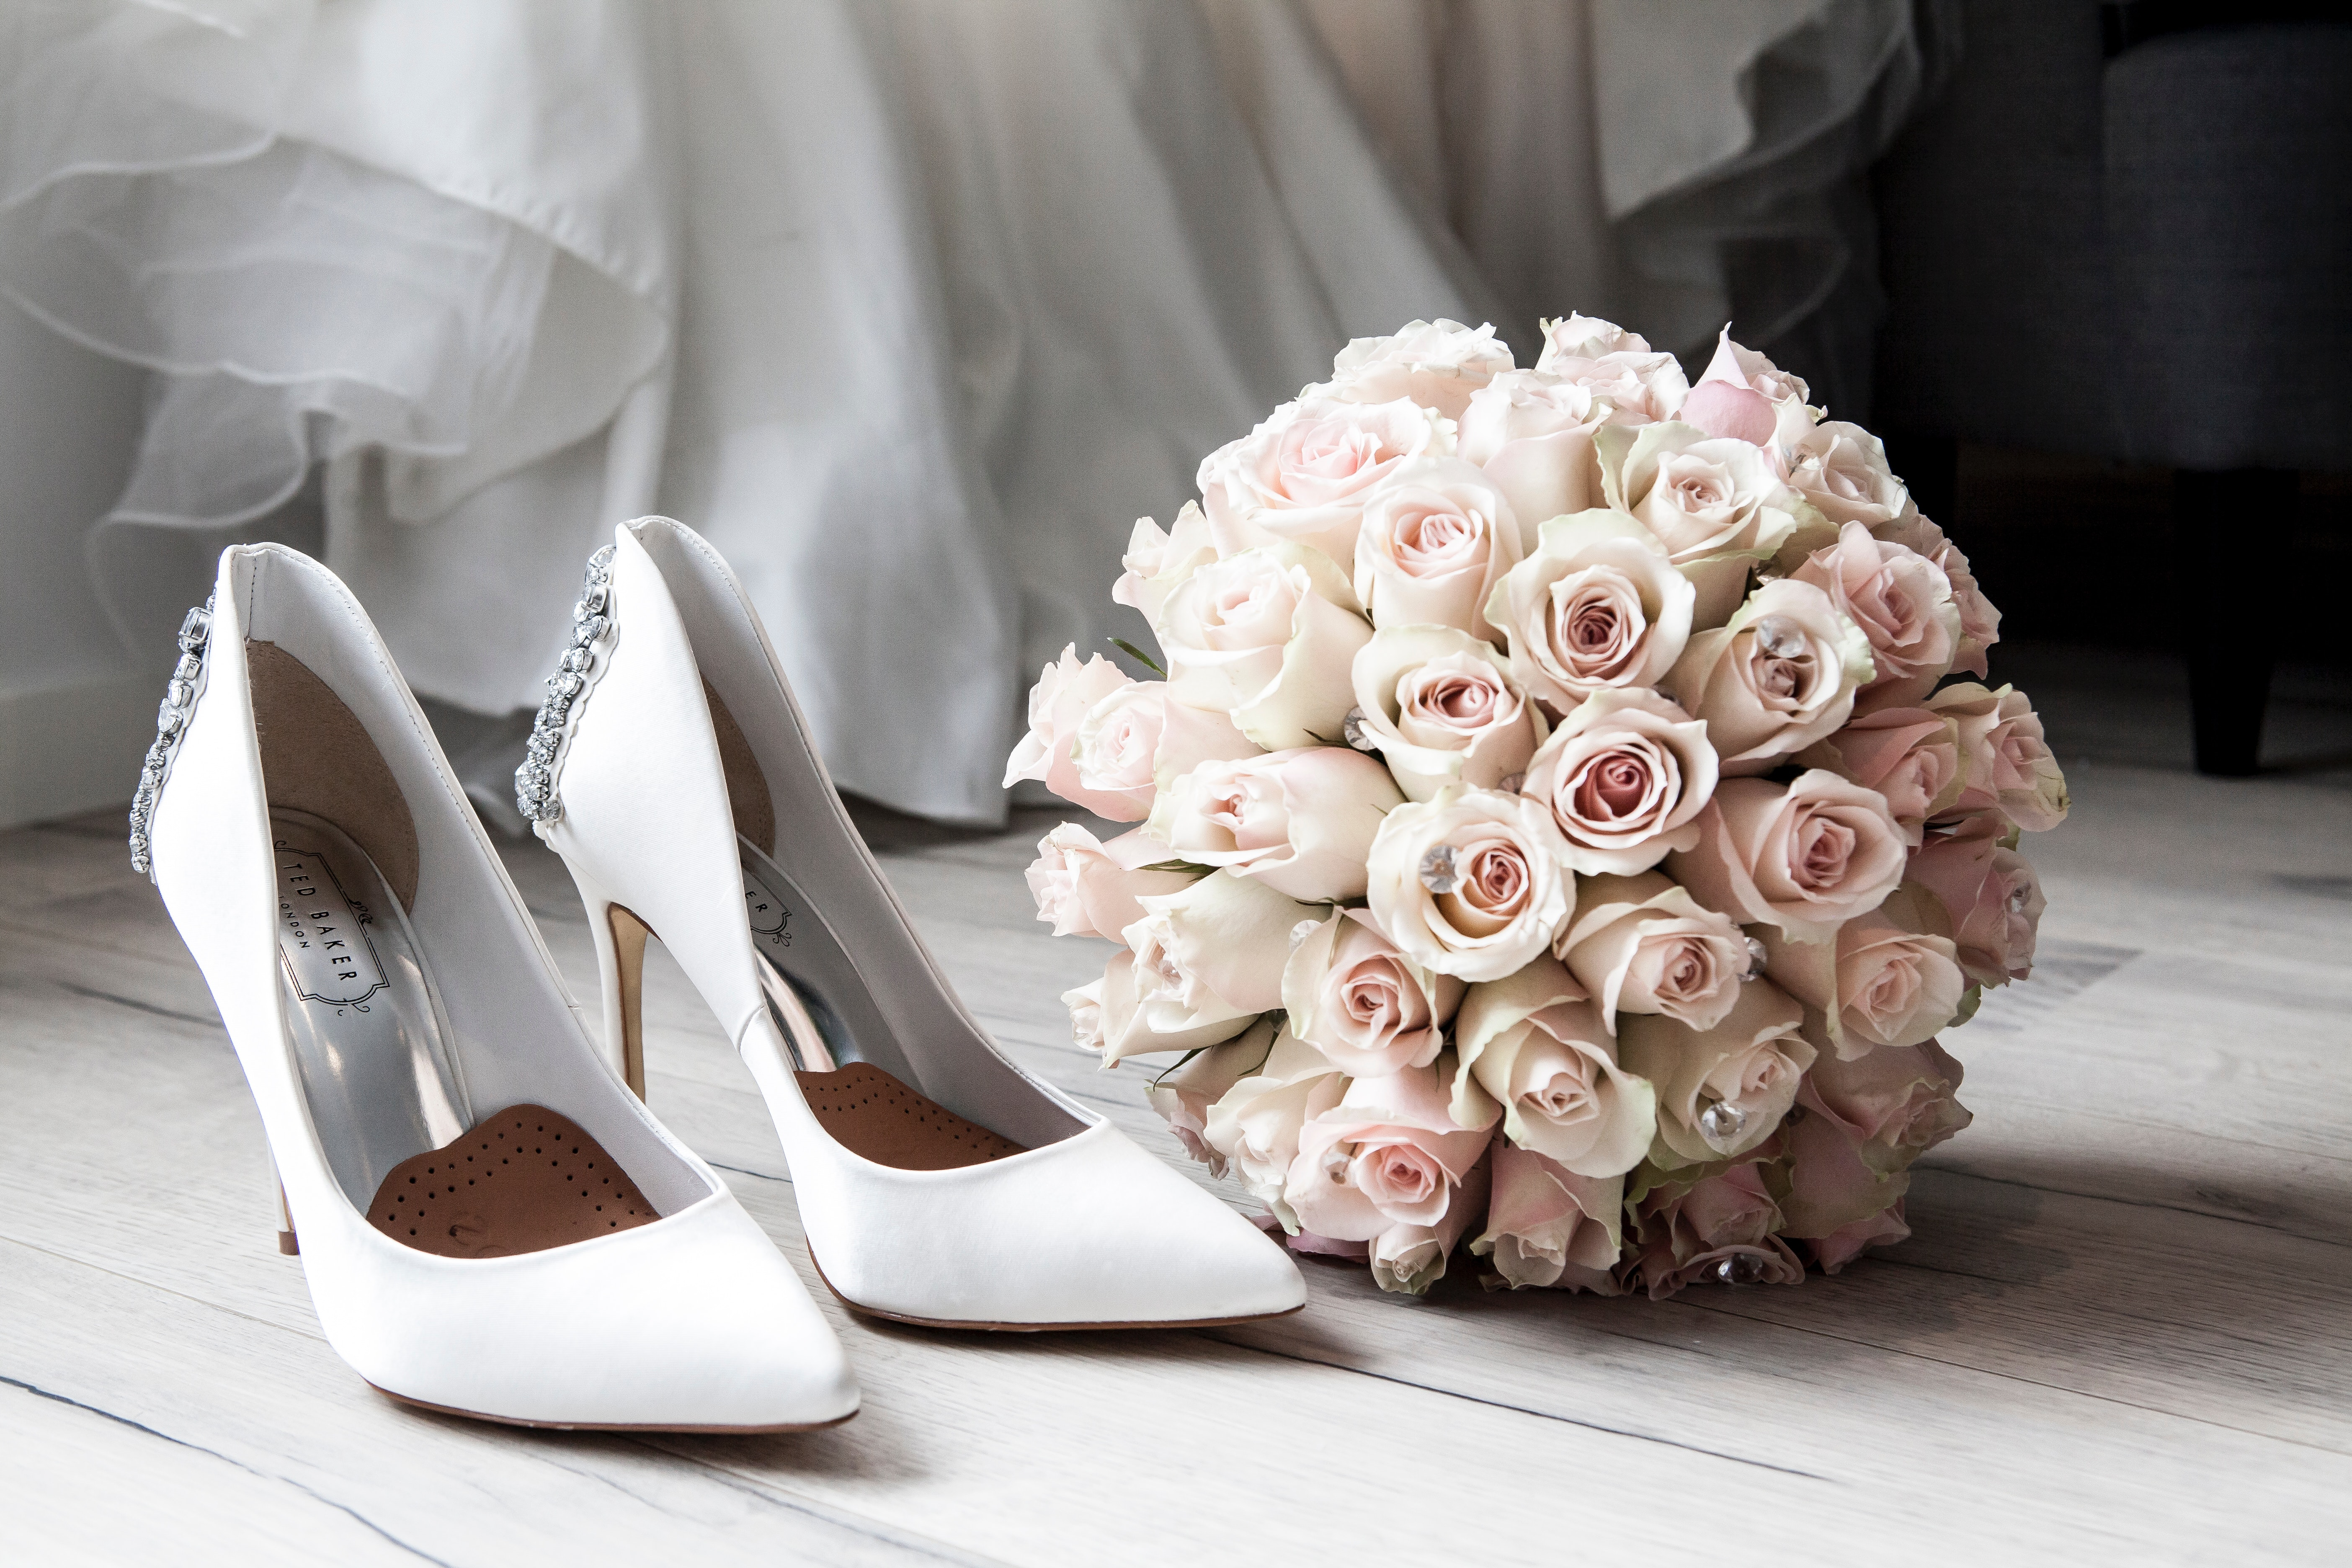 Wedding Preparation Free Stock Photo